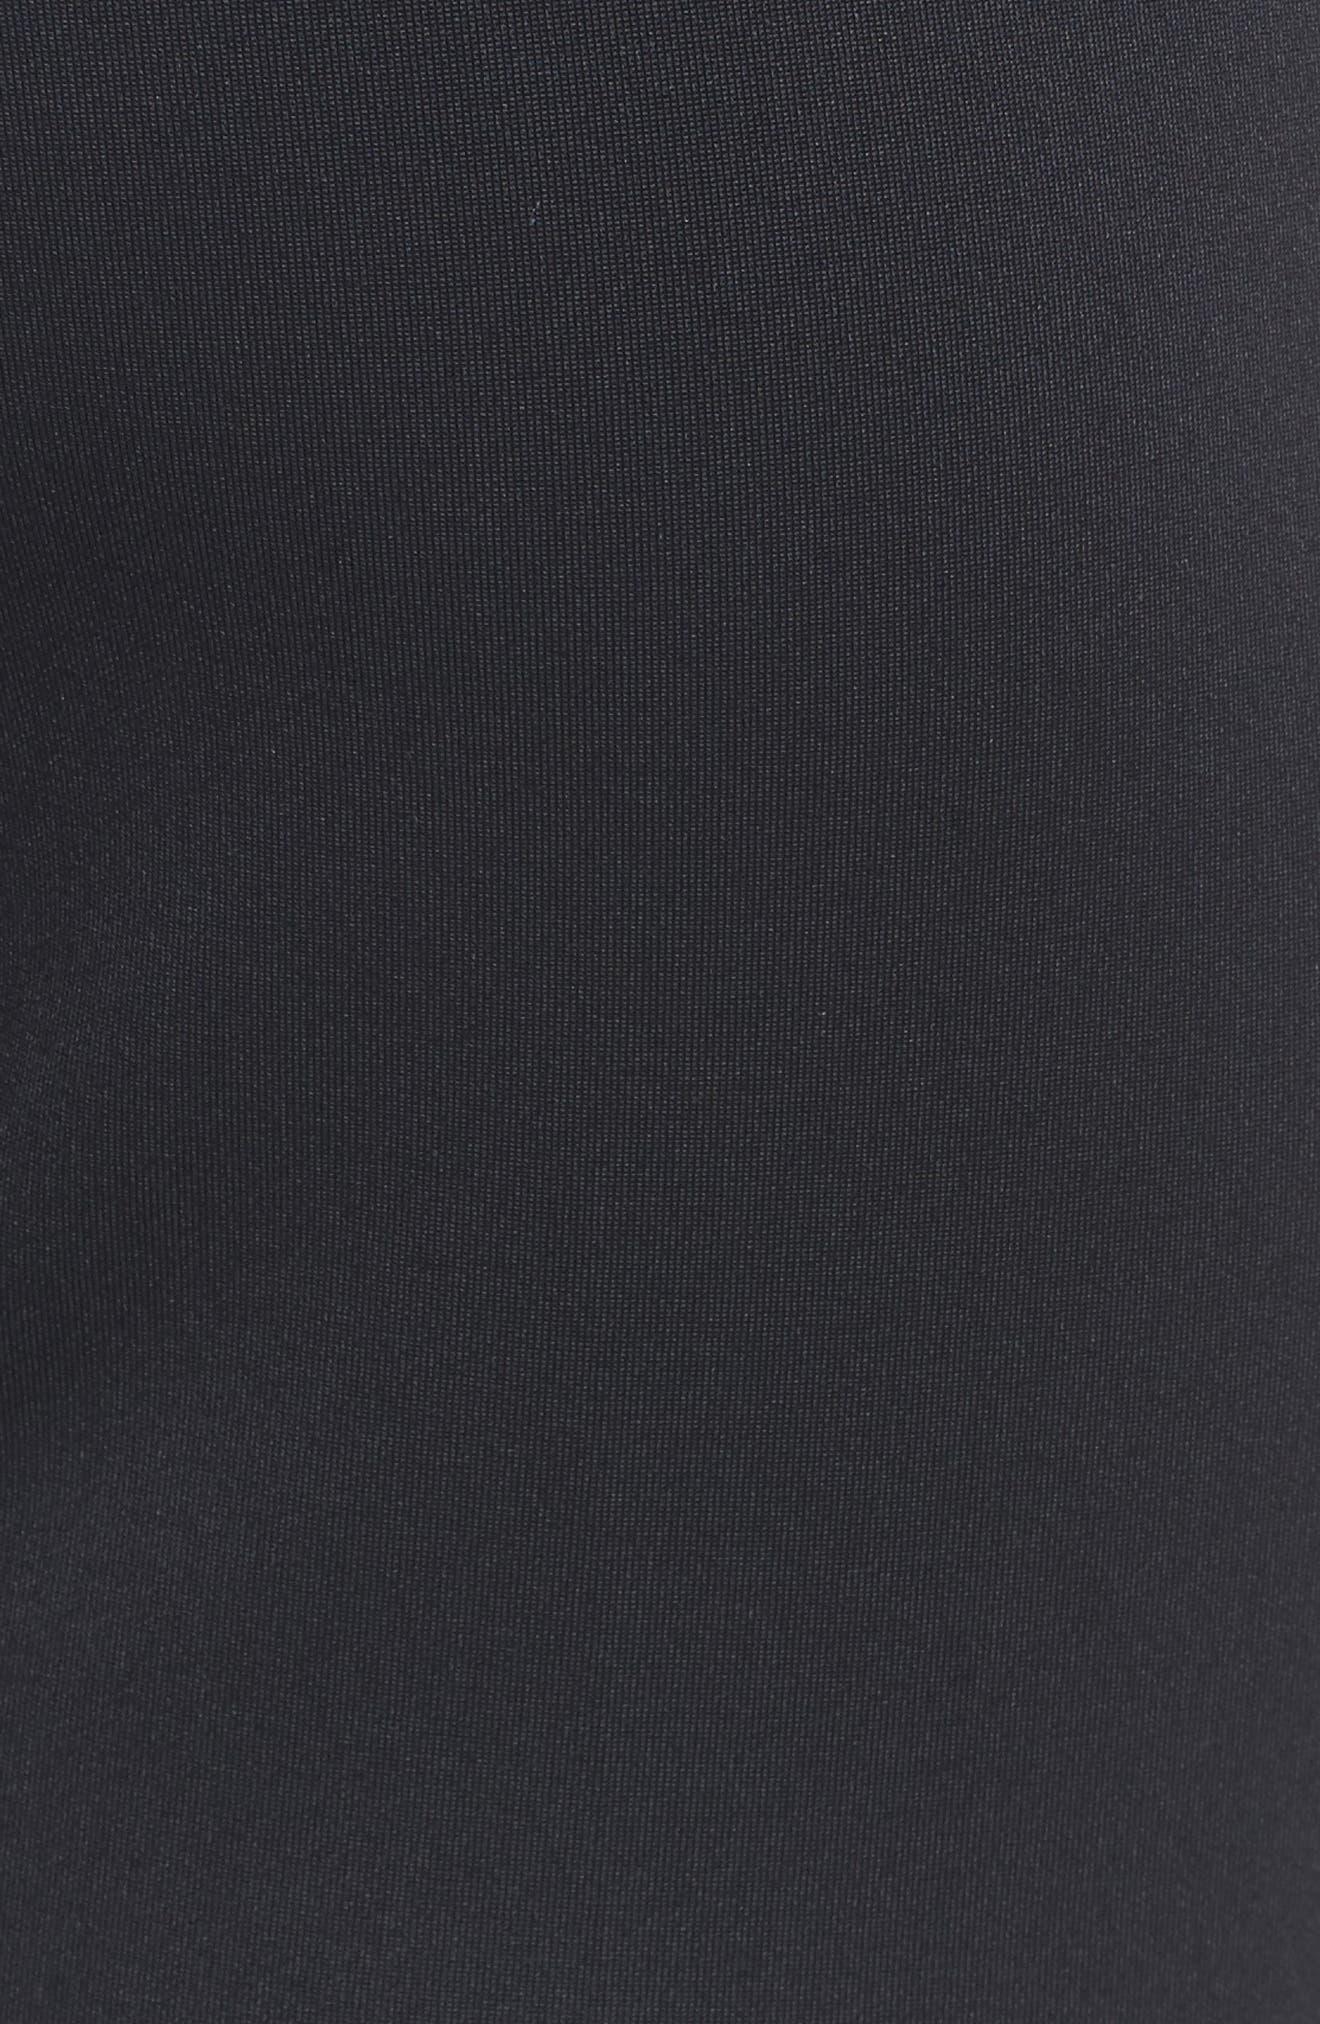 Rhinestone Side Stripe Track Pants,                             Alternate thumbnail 5, color,                             Black